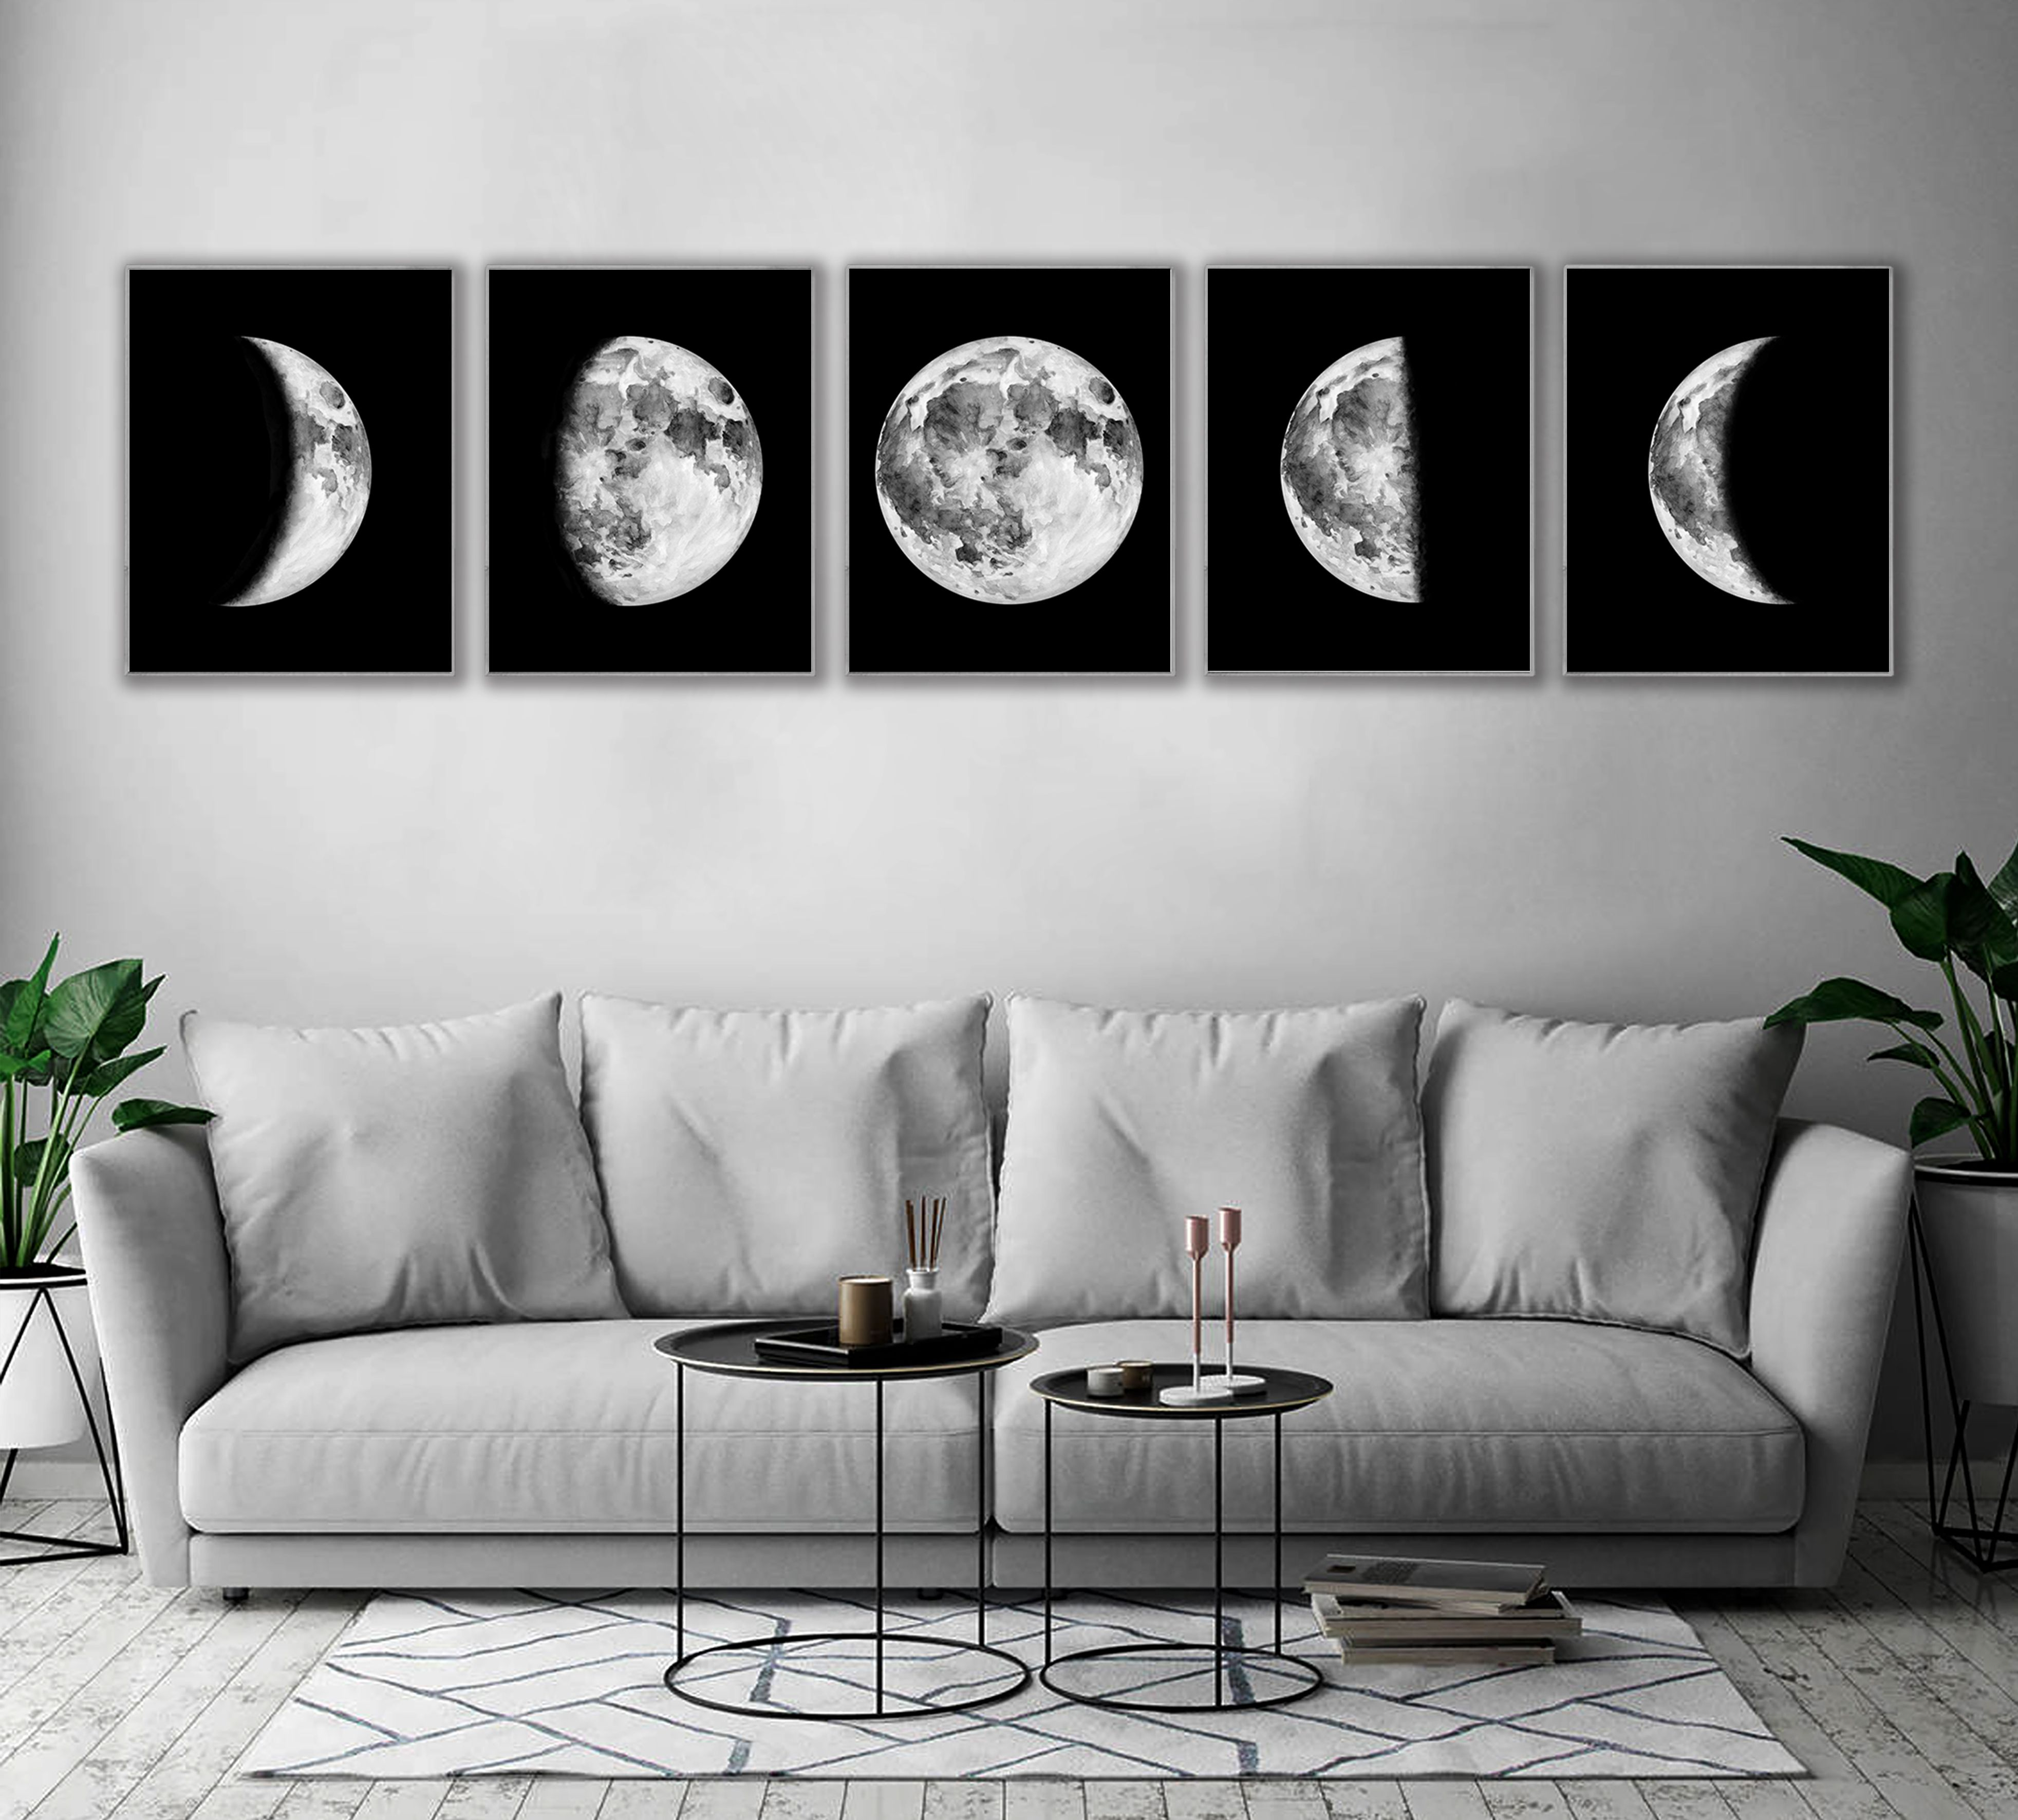 wall art sets for living room clocks moon phases nursery decor boy bedroom 5 digital download printable set phase print large prints